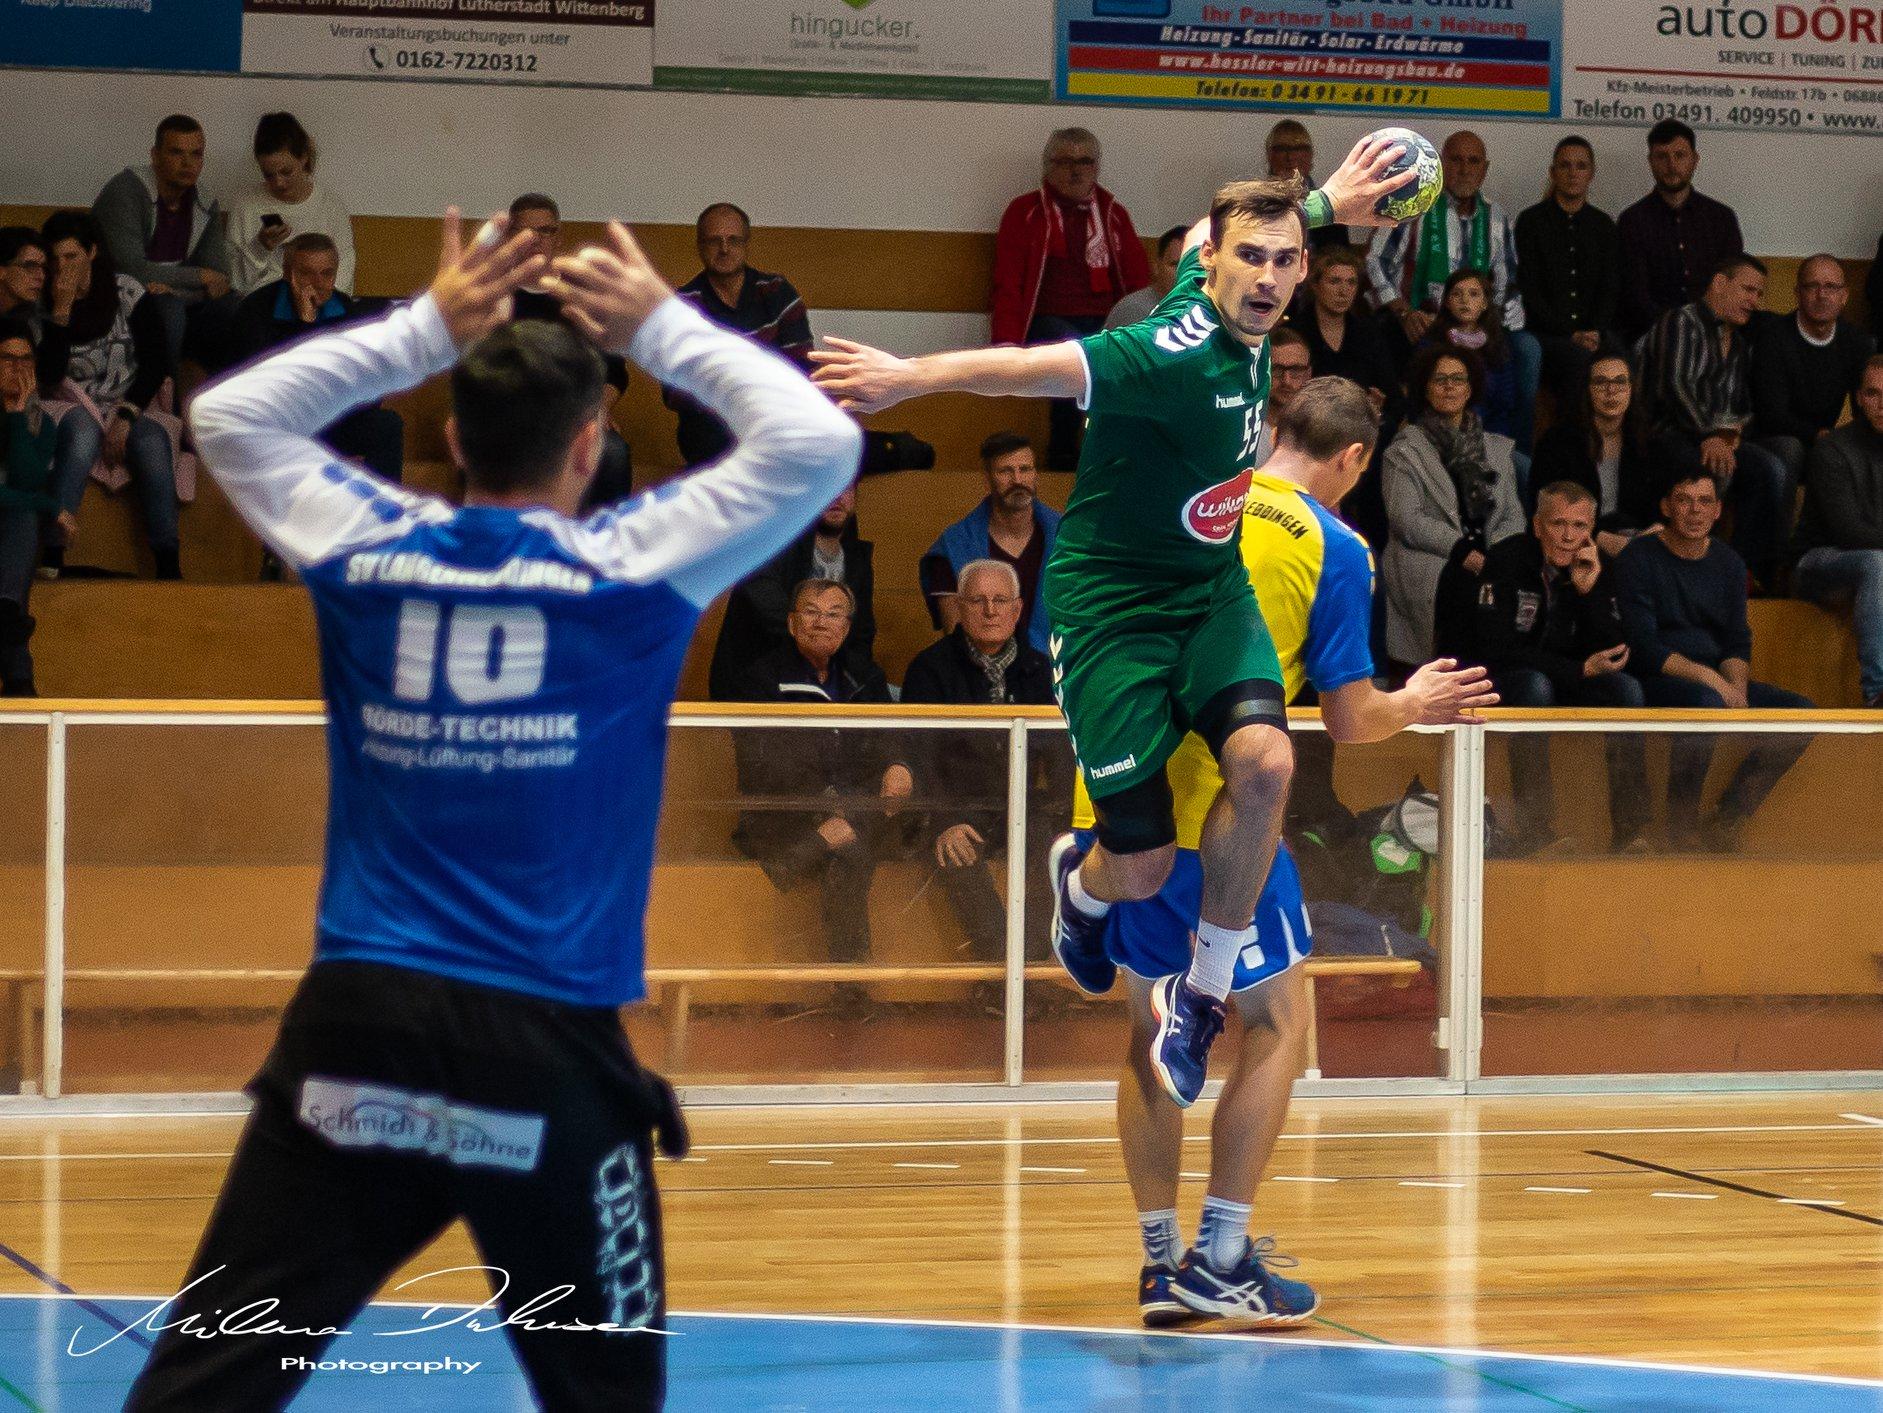 Jurijs Piščuhins (Foto: SV Grün-Weiß Wittenberg-Piesteritz Abt. Handball)